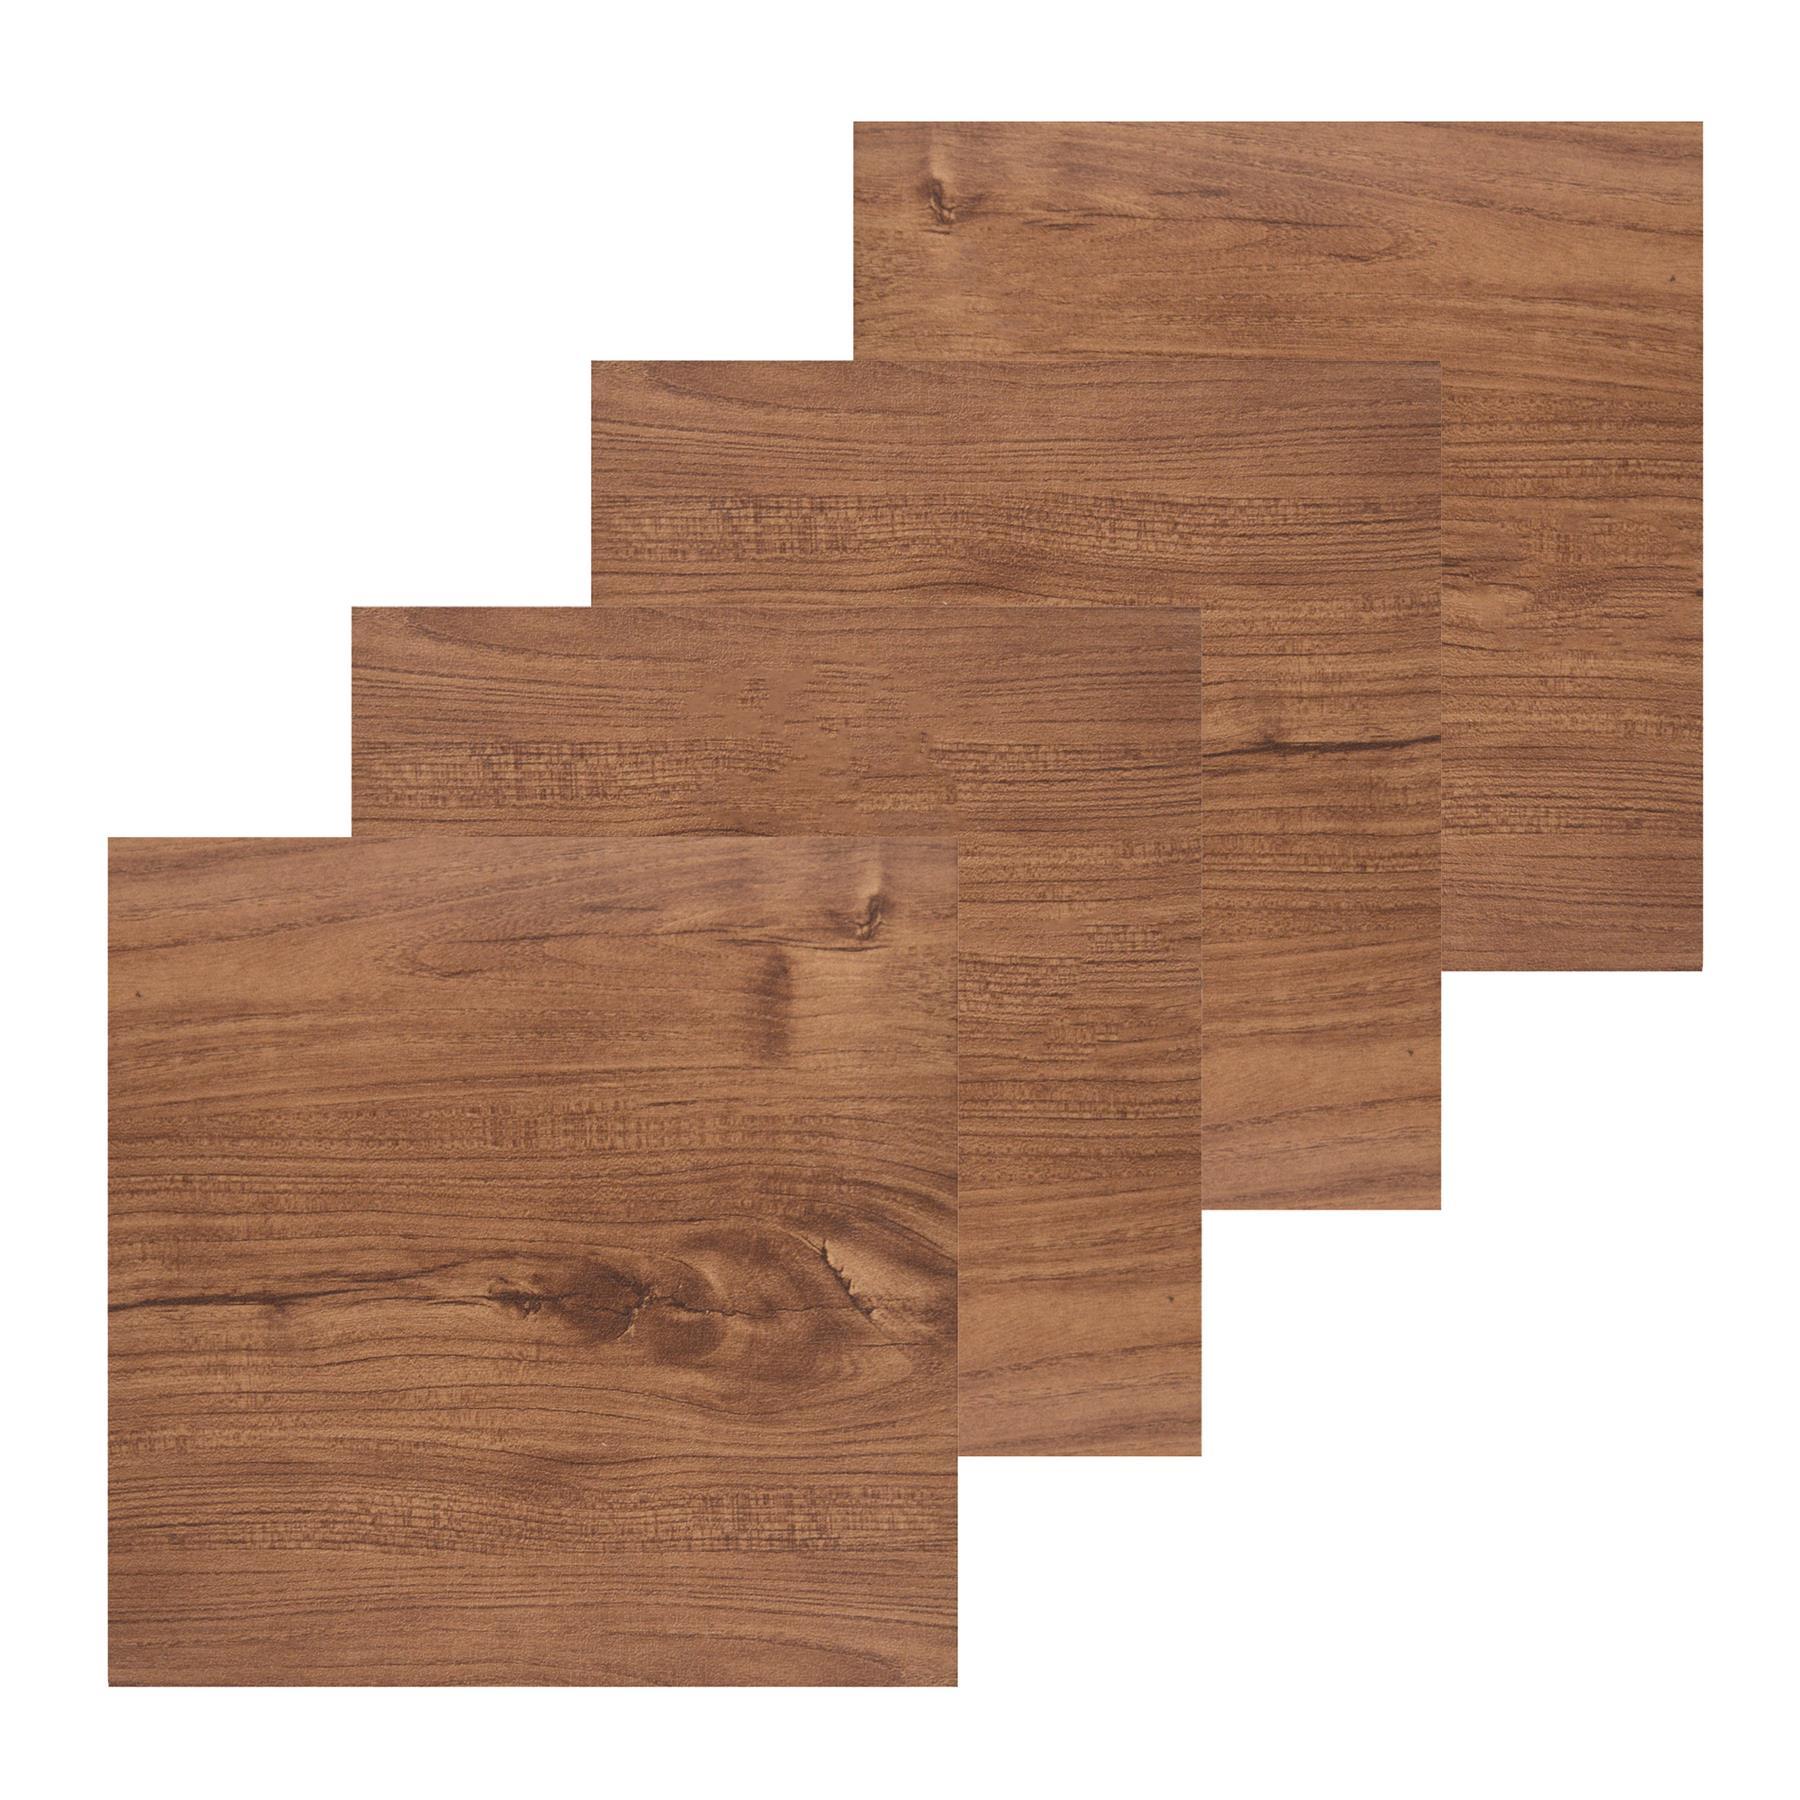 Floor-Tiles-Self-Adhesive-Vinyl-Flooring-Kitchen-Bathroom-Brown-Wood-Grain thumbnail 3